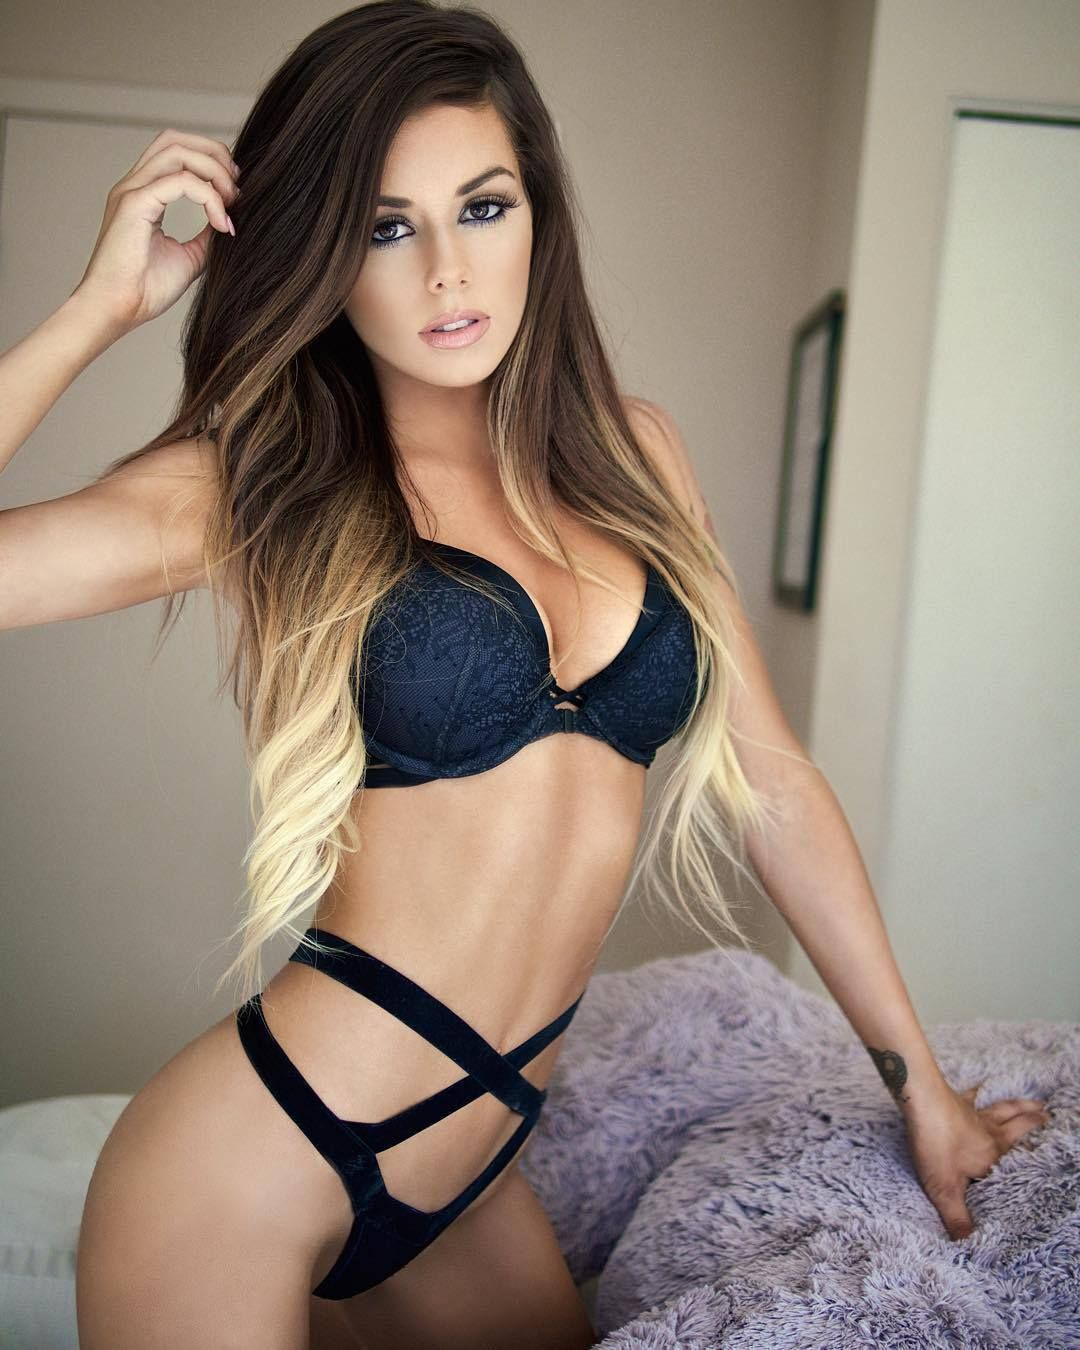 Stunningly Sexy Brunette Teen 51